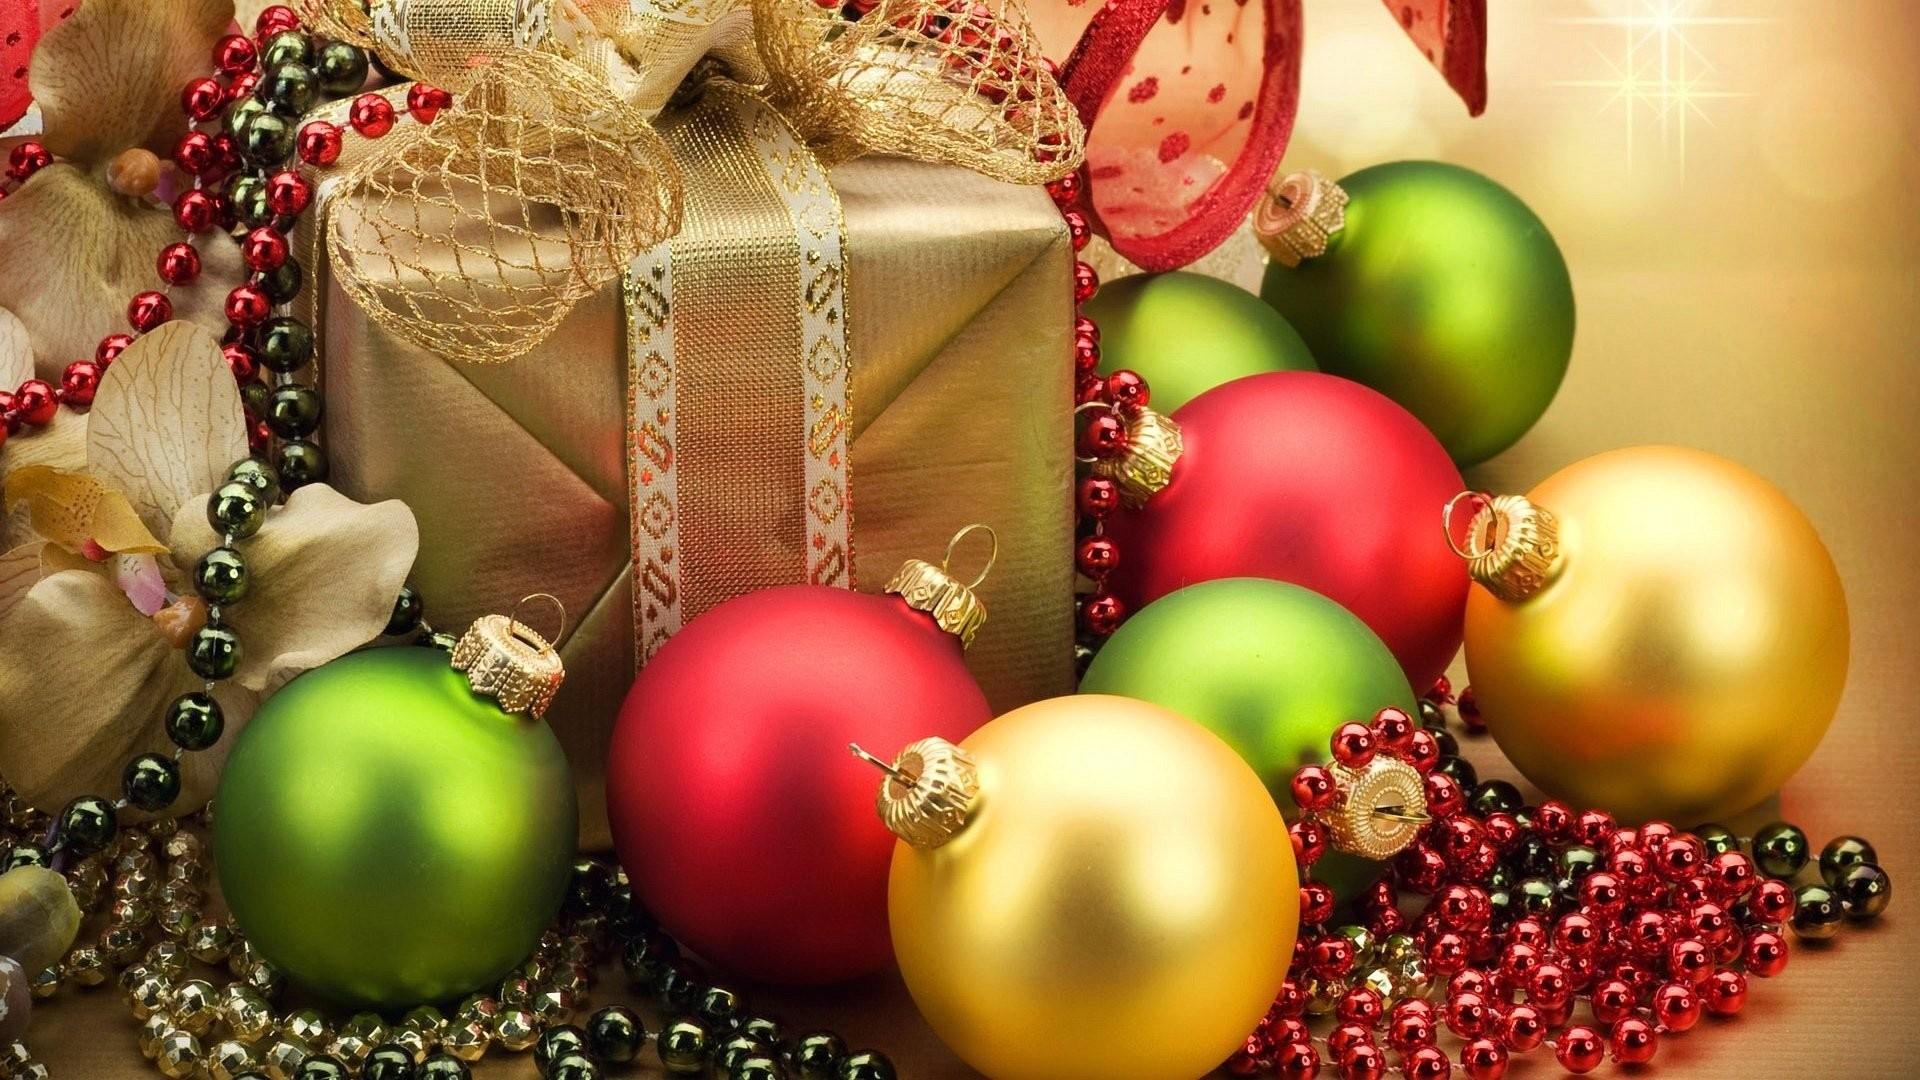 … wallpaper-christmas-present-and-balls.jpg …